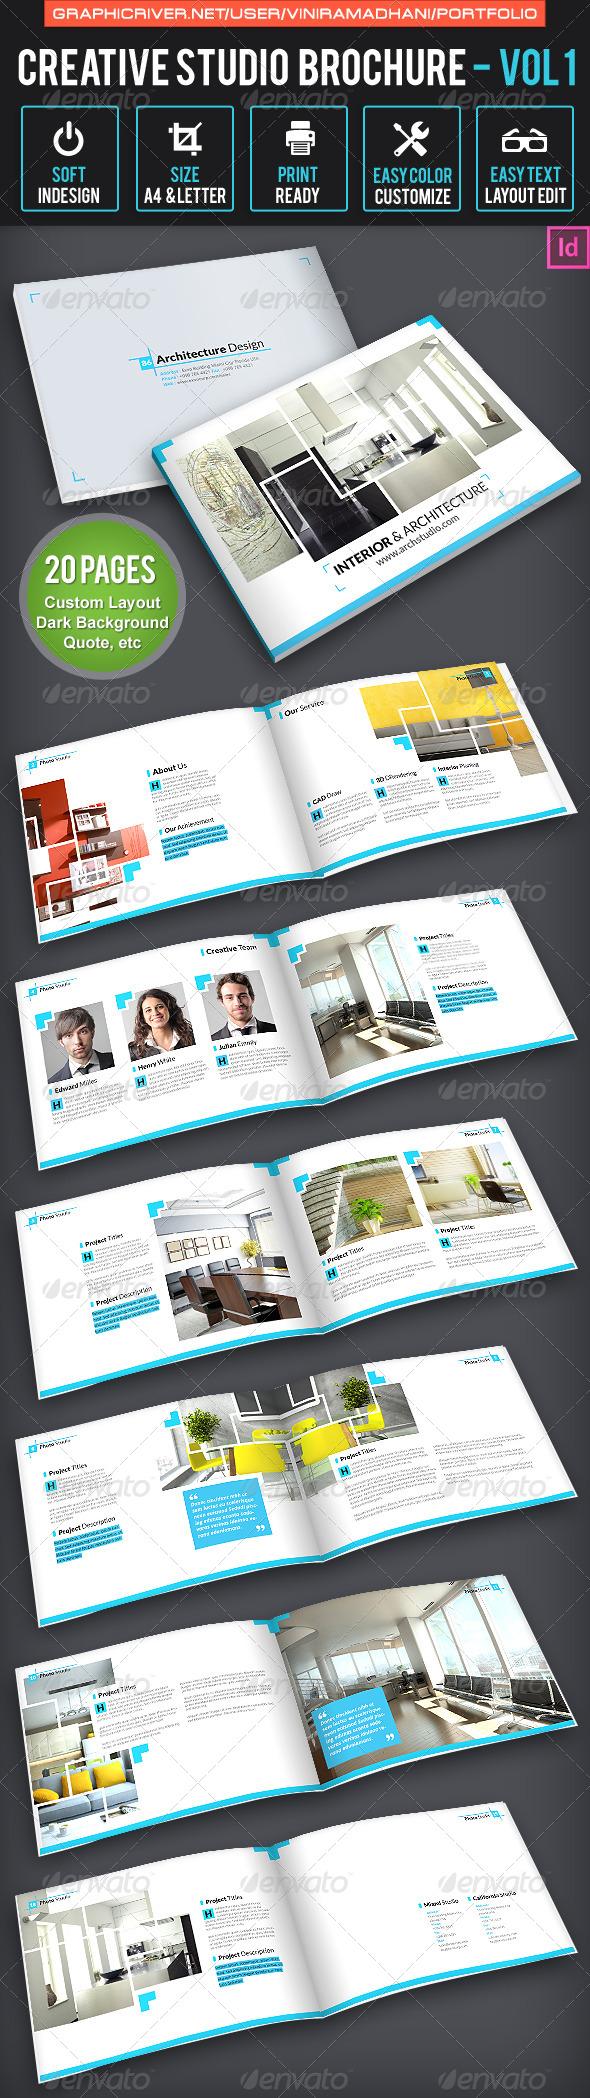 GraphicRiver Creative Studio Brochure Volume 1 6531207